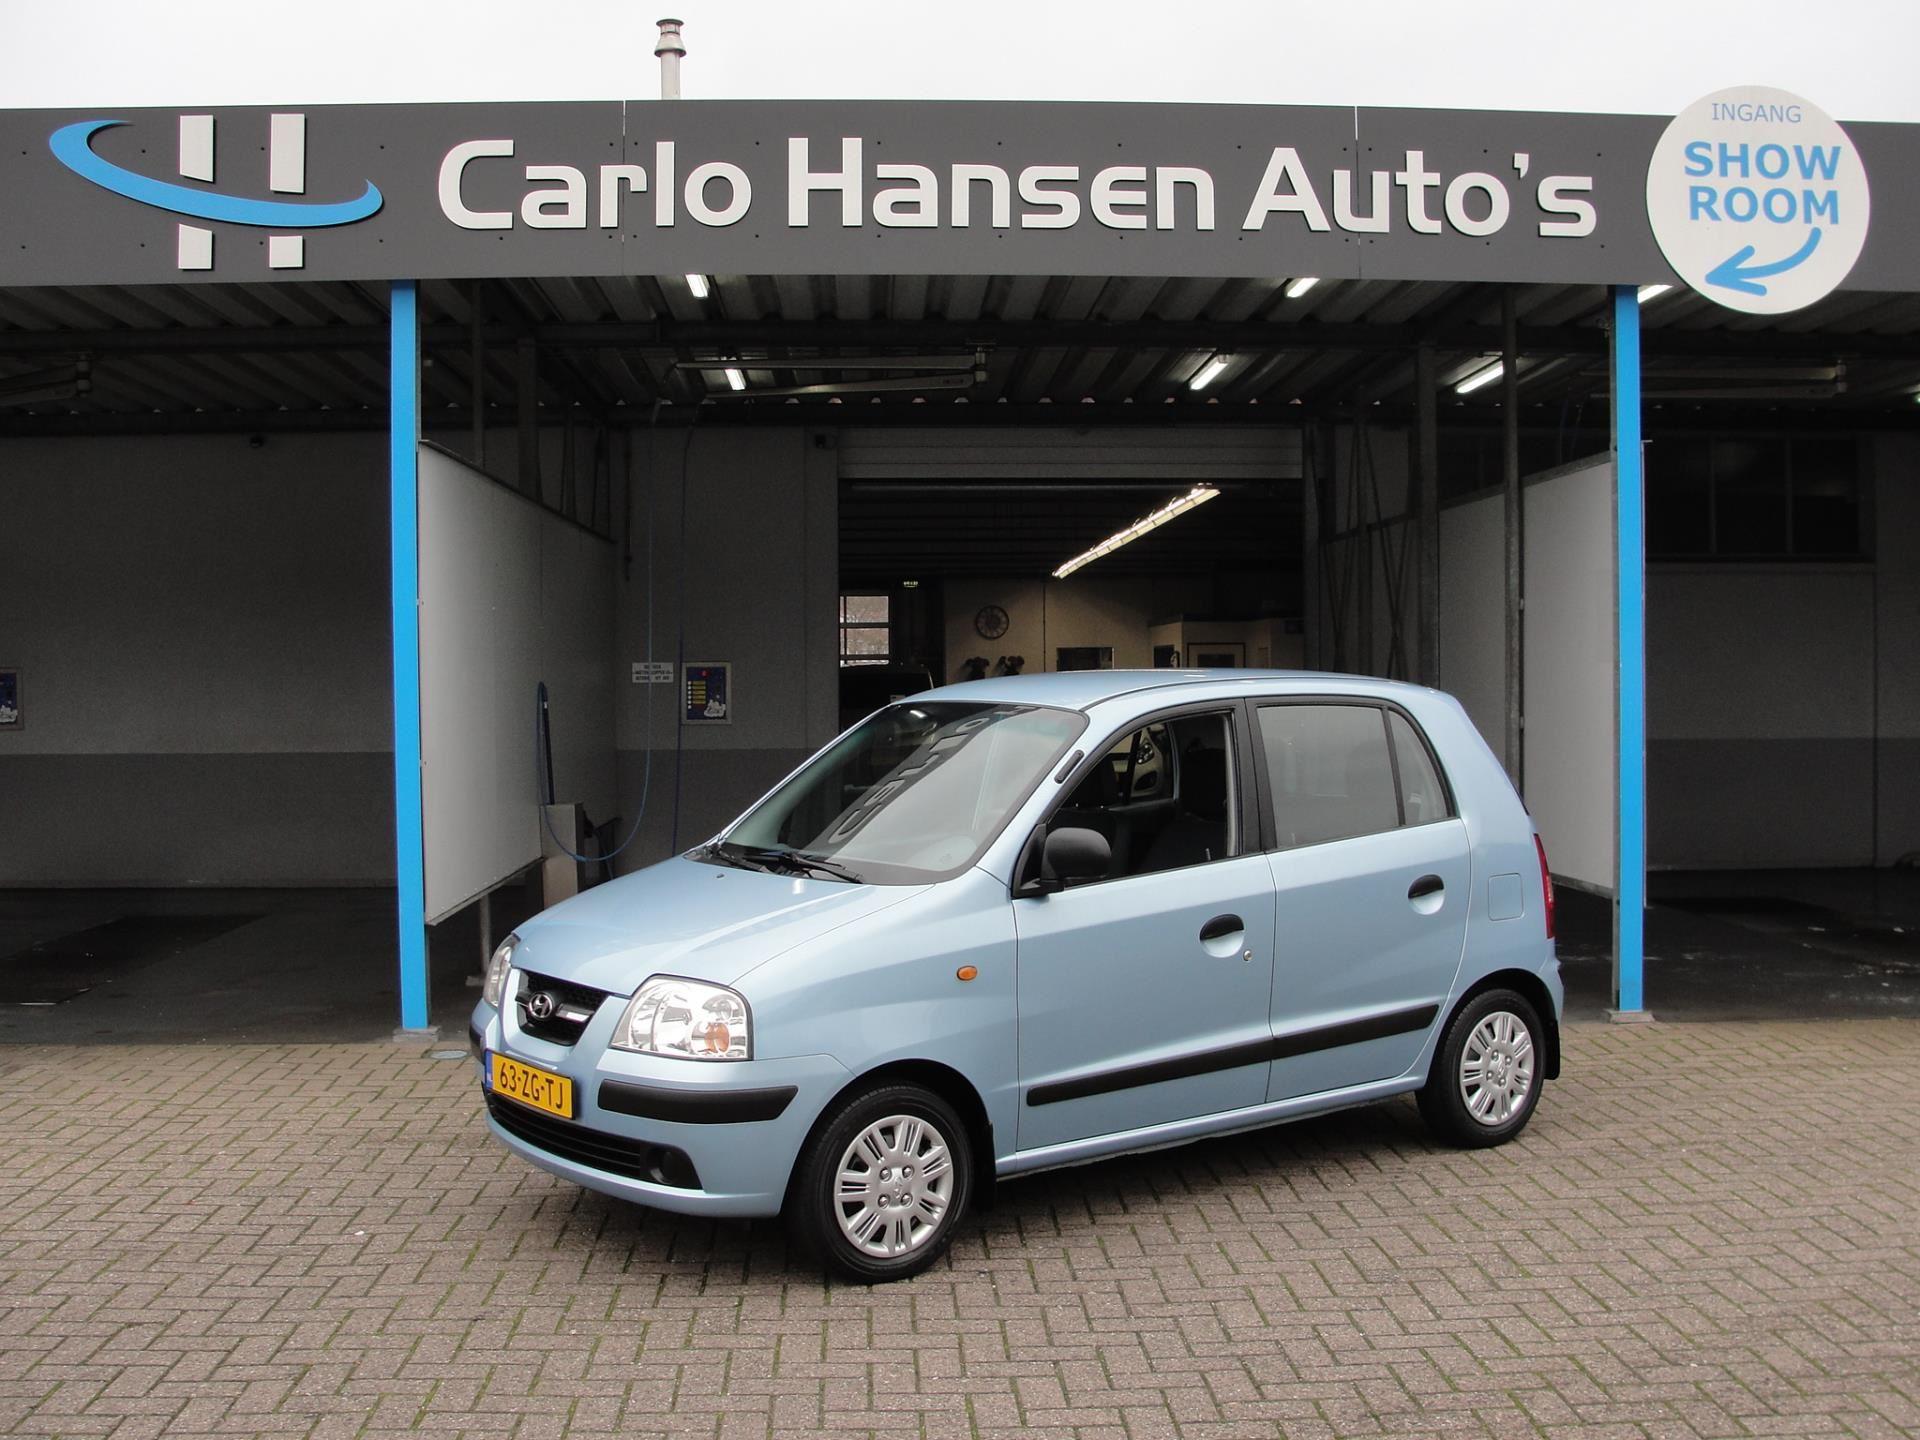 Hyundai Atos occasion - Autobedrijf Carlo Hansen